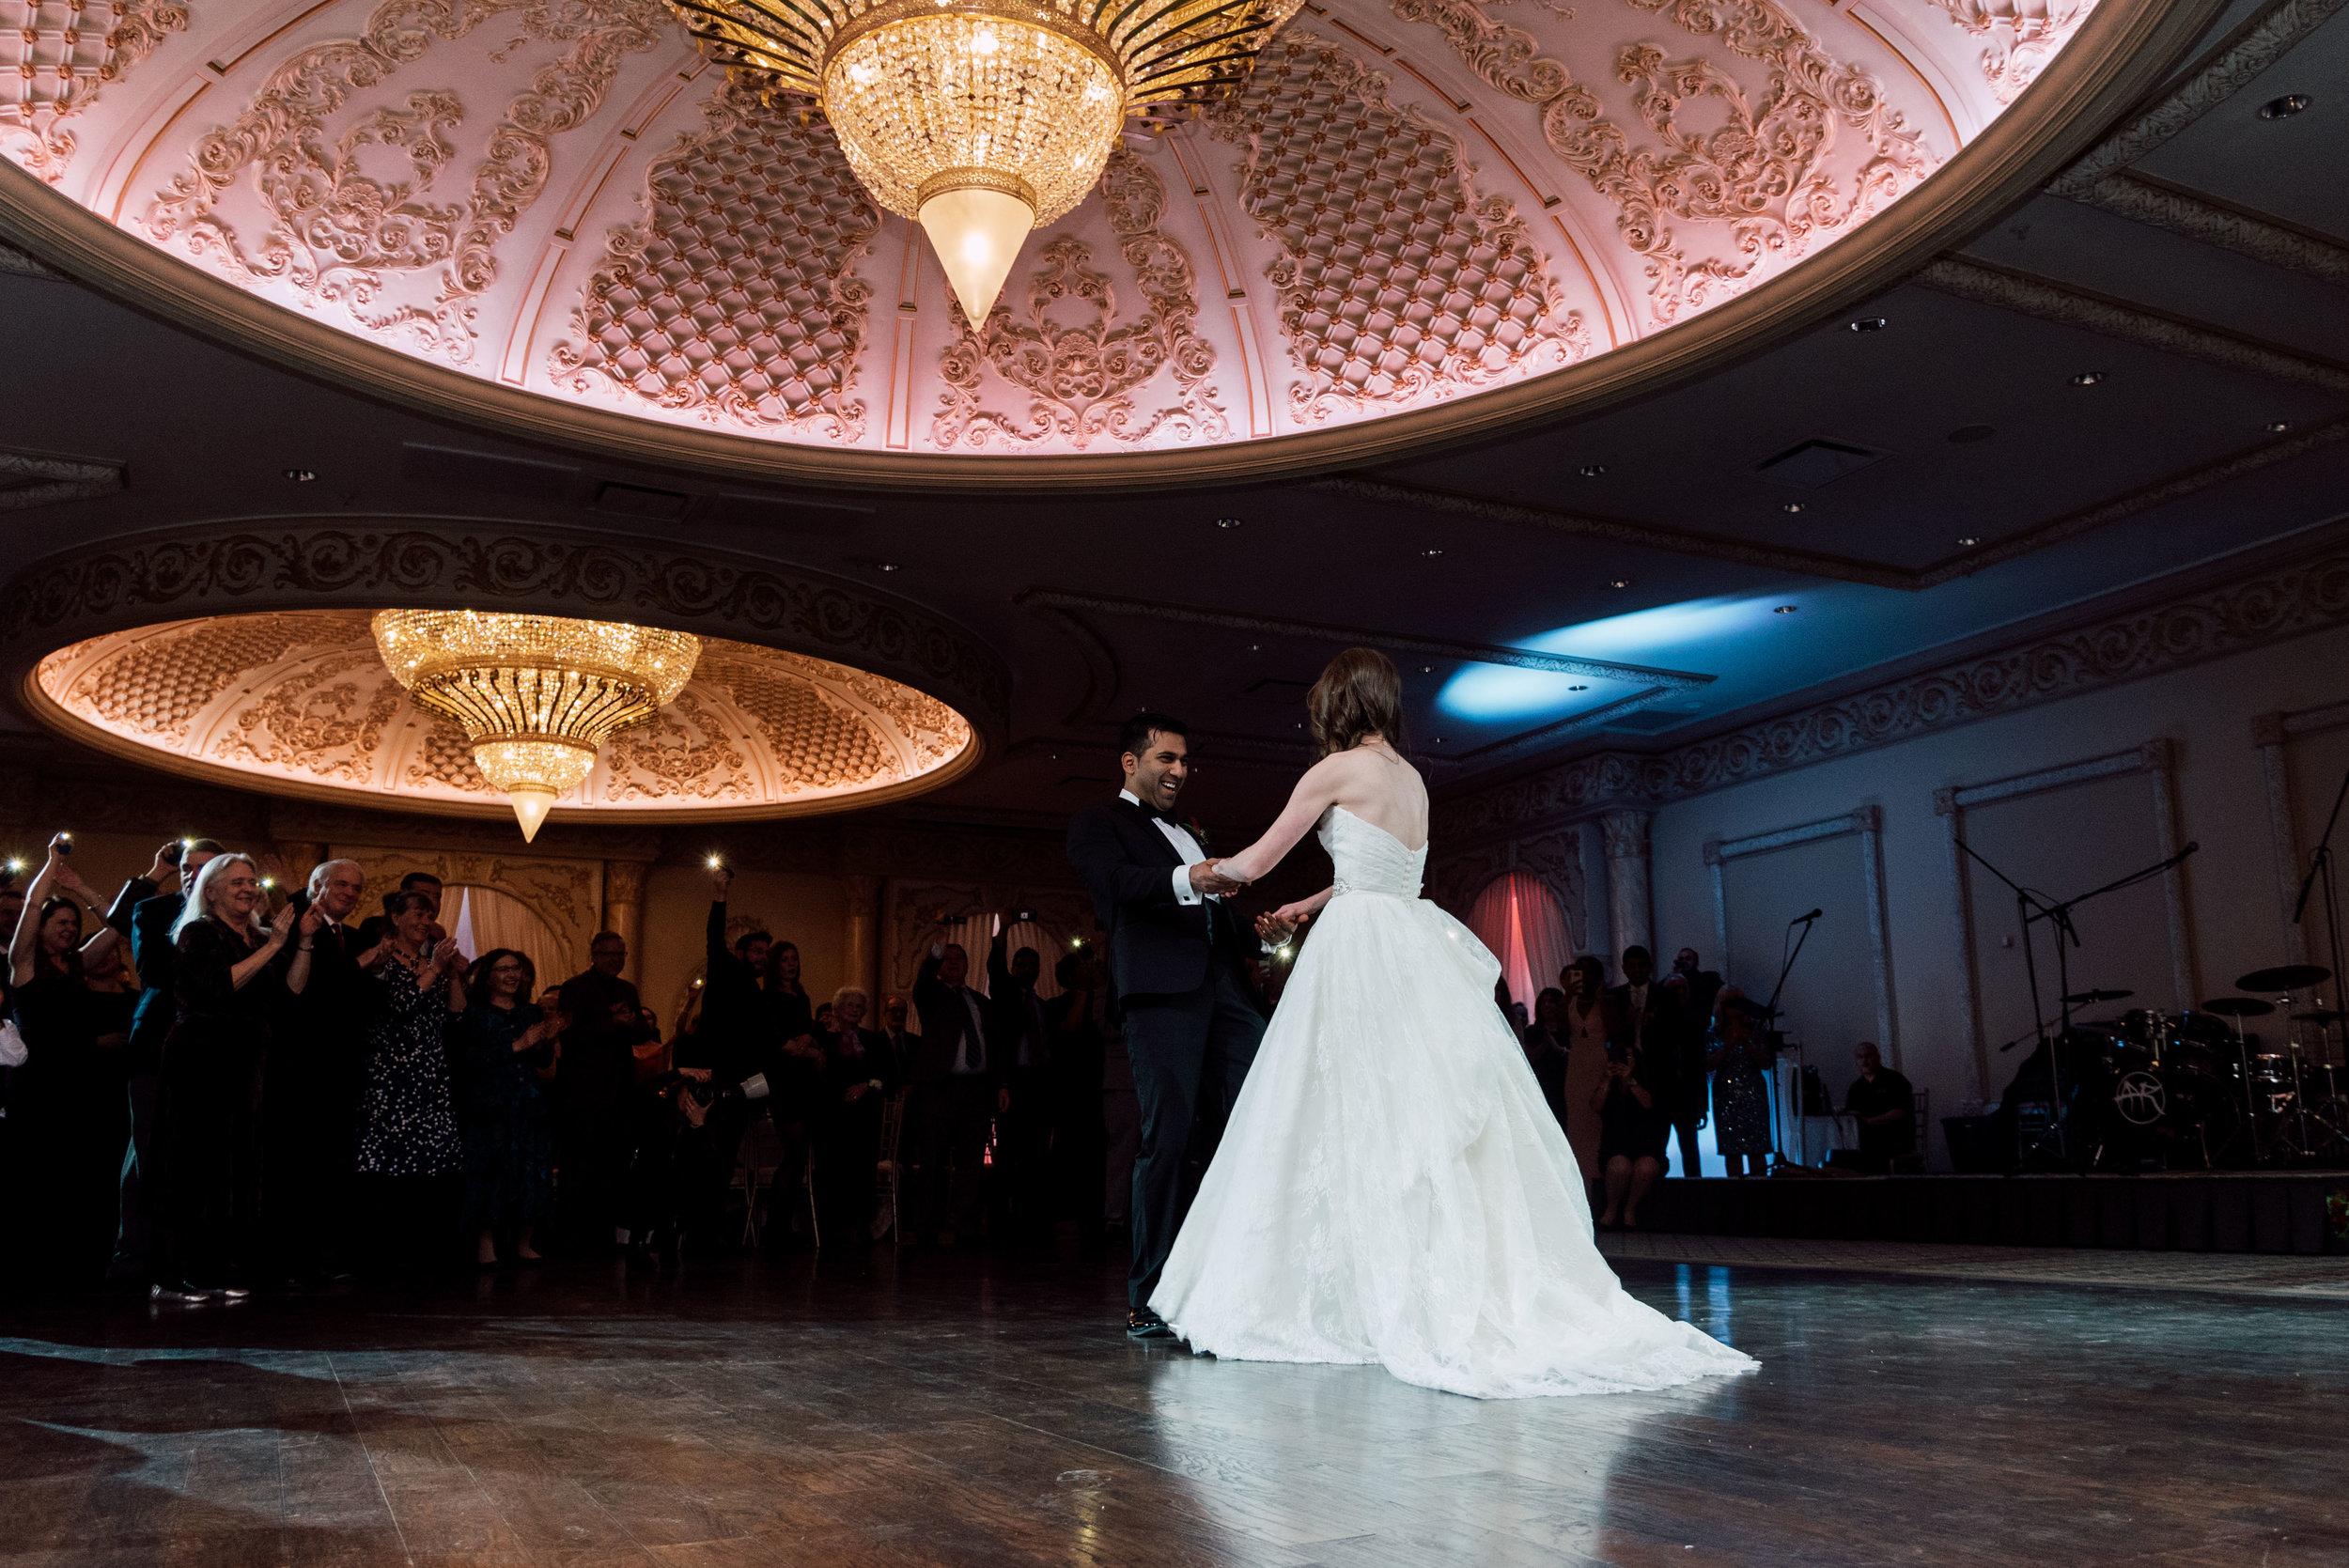 Paradise_Hall_Blessed_Trinity_Church_Wedding_Jonathan_Rebecca_Wedding_Toronto-8321.jpg